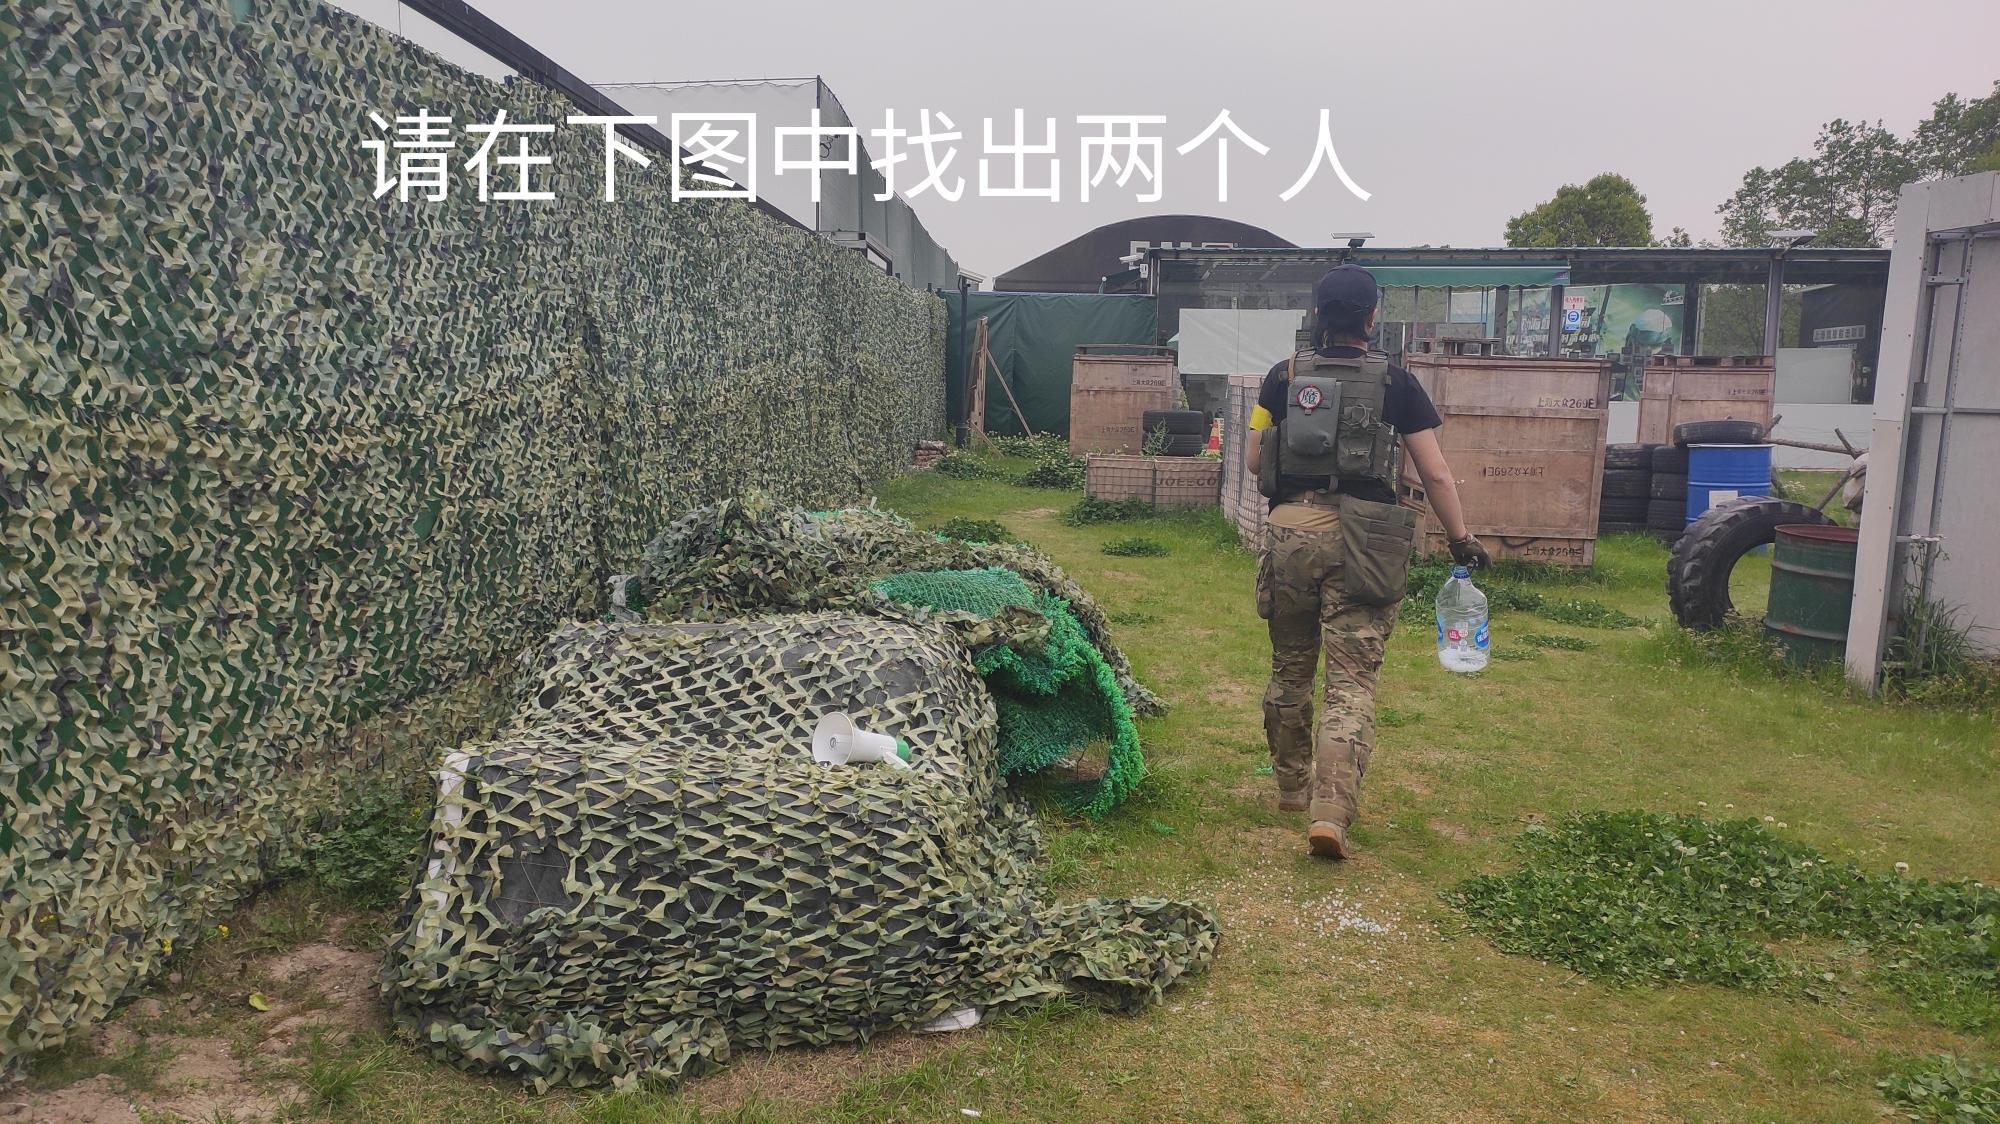 上海Wargame下场剪辑